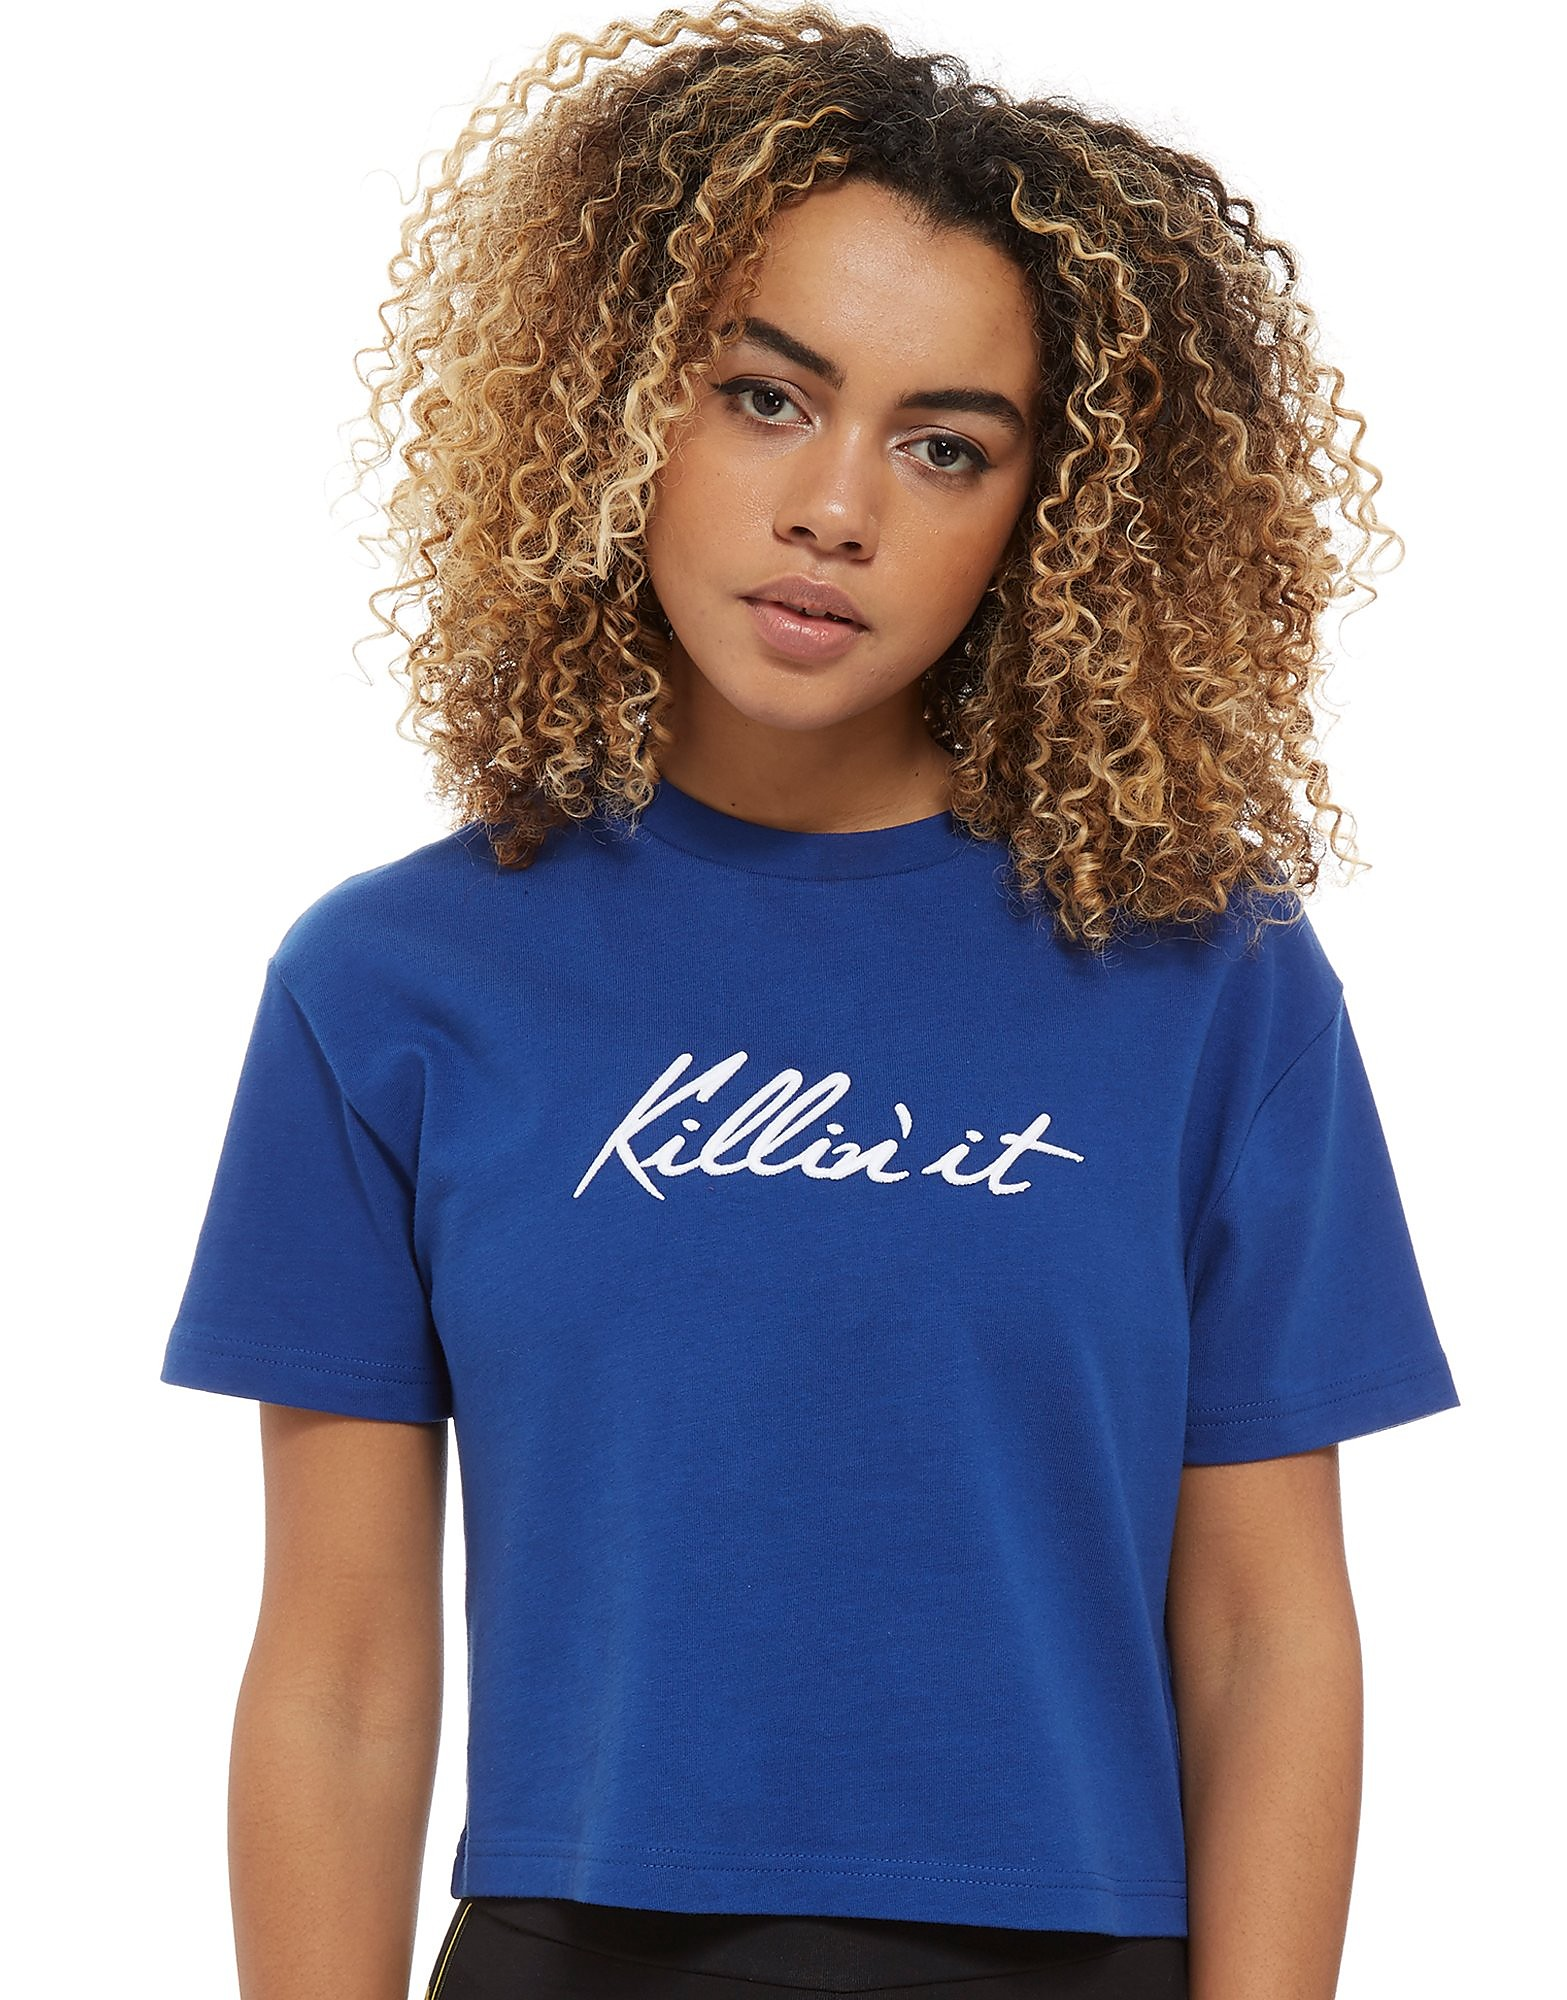 Supply & Demand Killing It T-Shirt